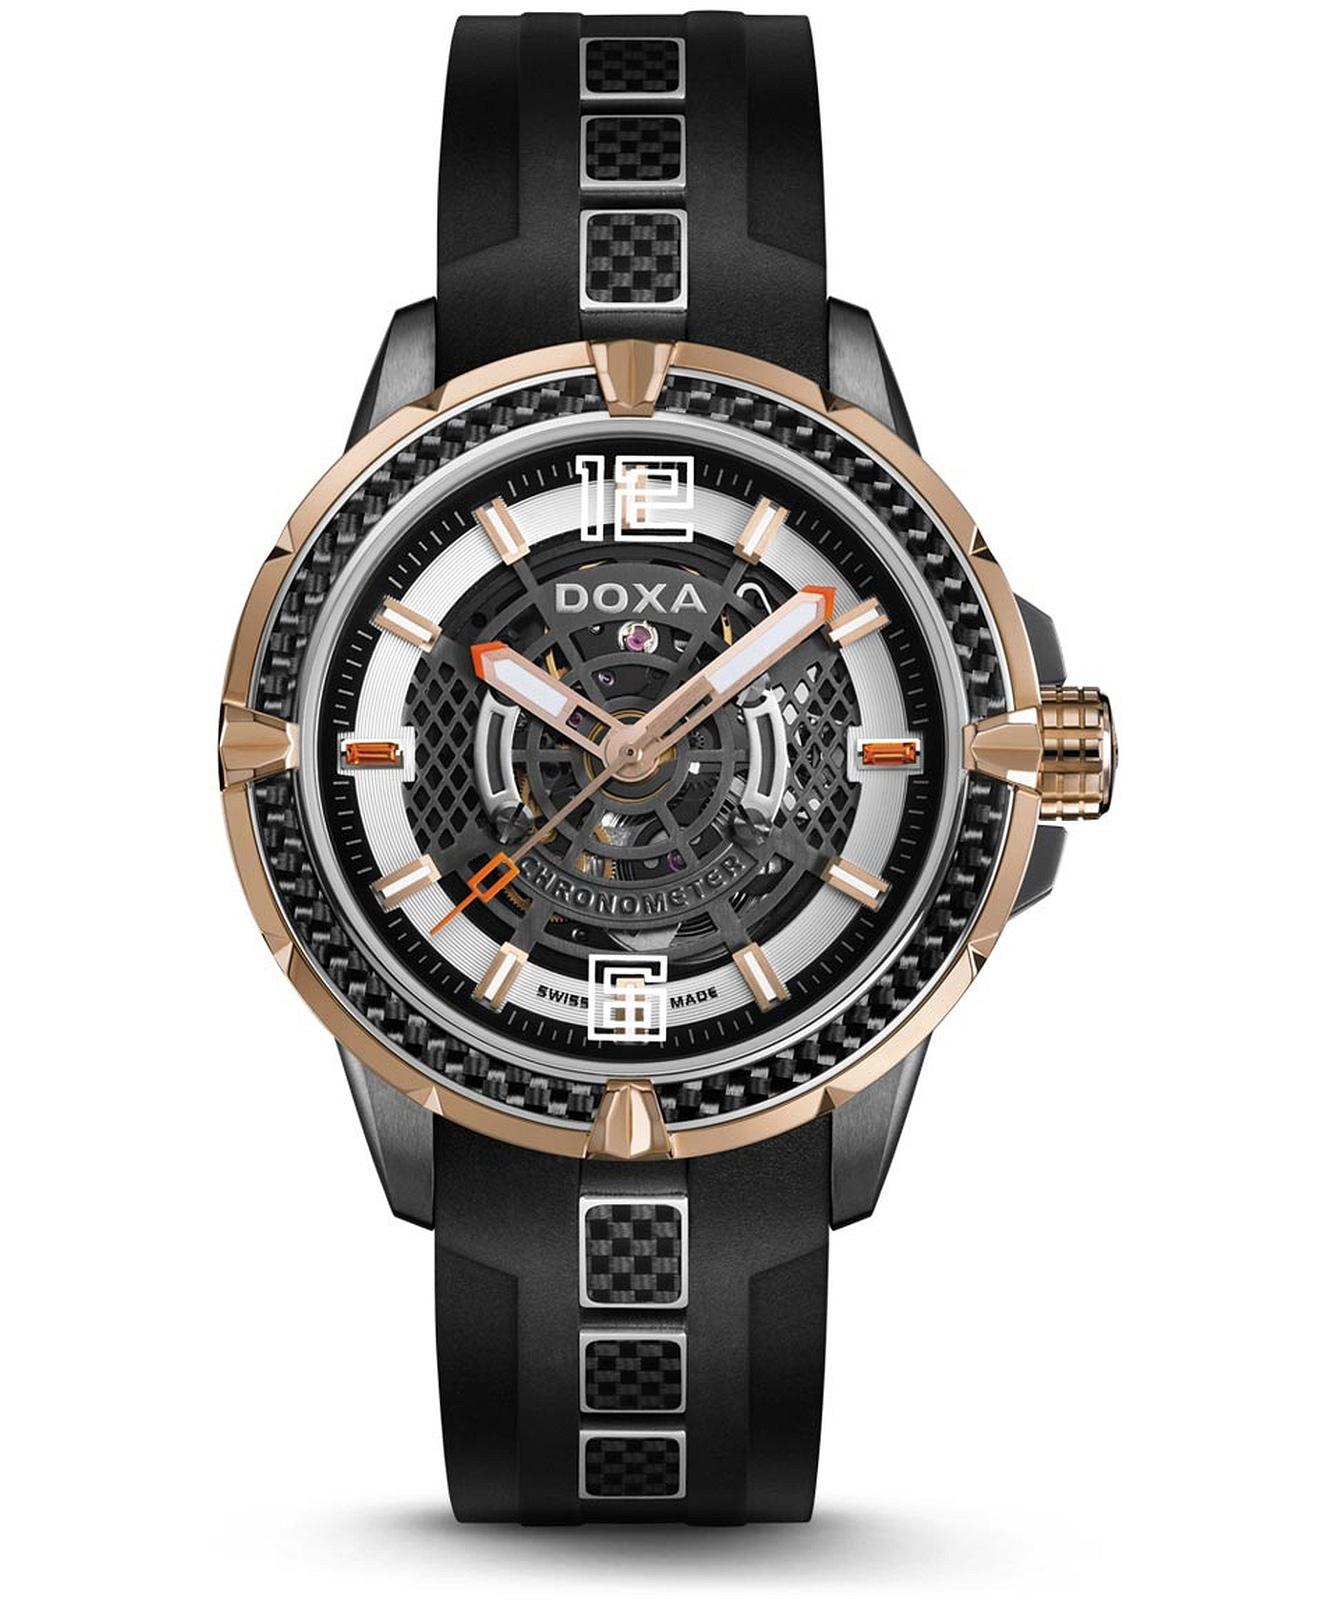 zegarek-meski-doxa-trofeo-tc-skeleton-titanium-automatic-chronometer-limited-edition-d192rbo_001